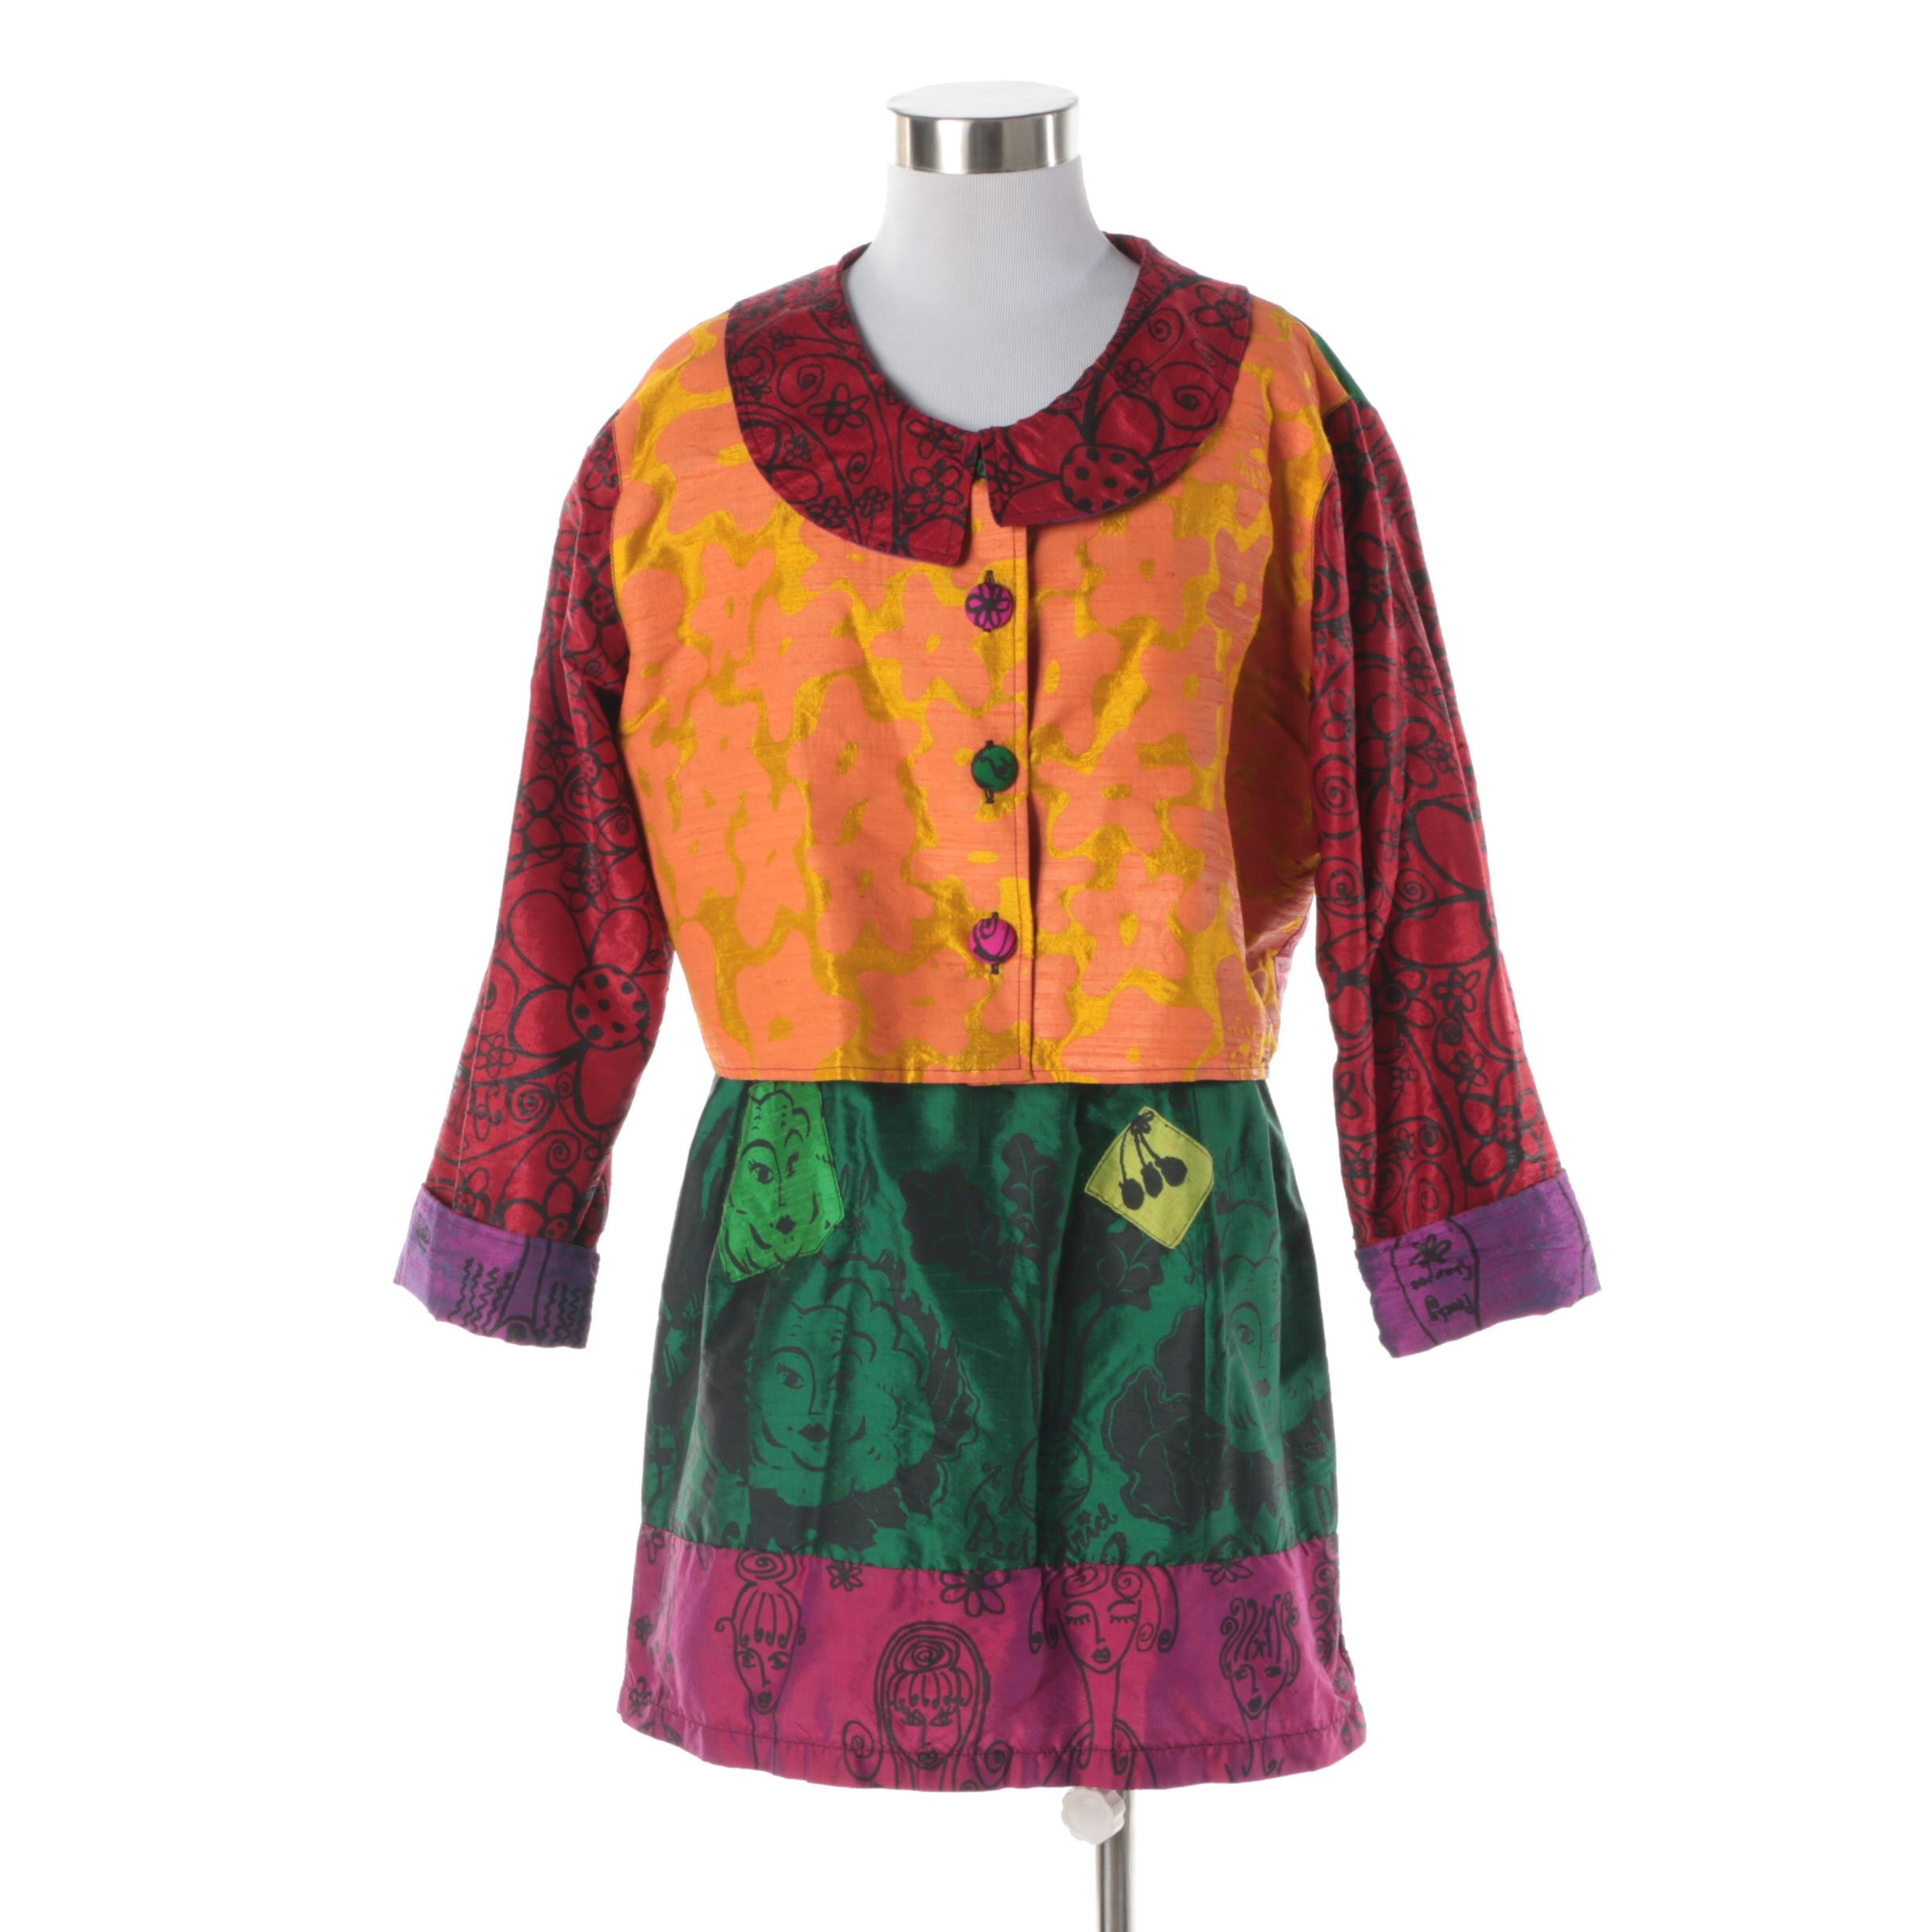 Women's Peach Berserk Multicolored Silk Blend Sleeveless Dress and Jacket